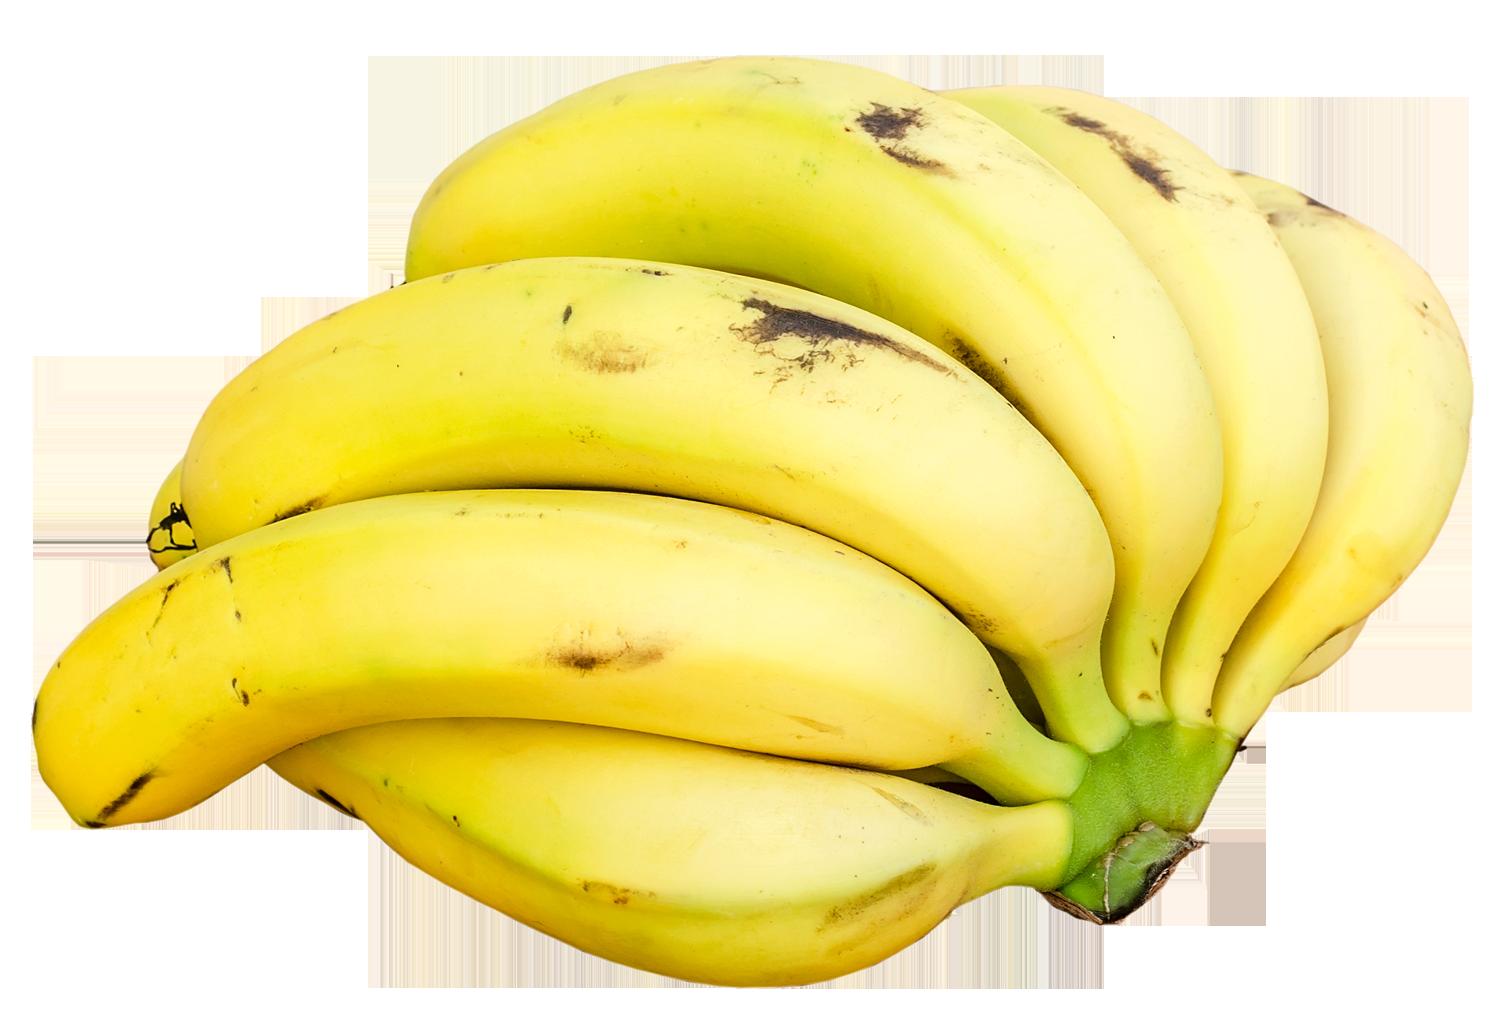 Banana Bunch PNG Image Cacho de banana, Banana